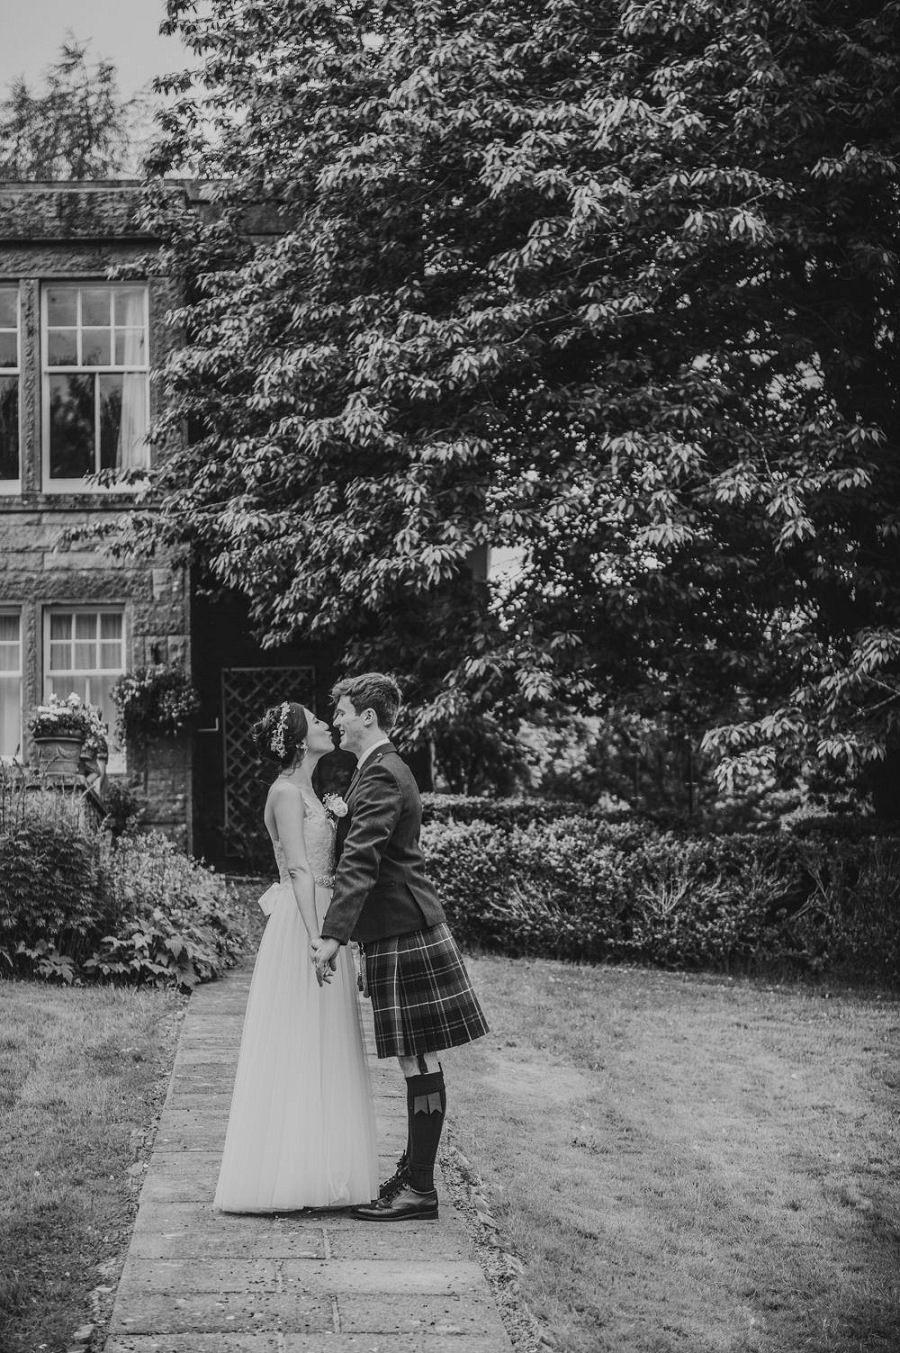 scottish-wedding-photography-vintage-photographer-034.jpg